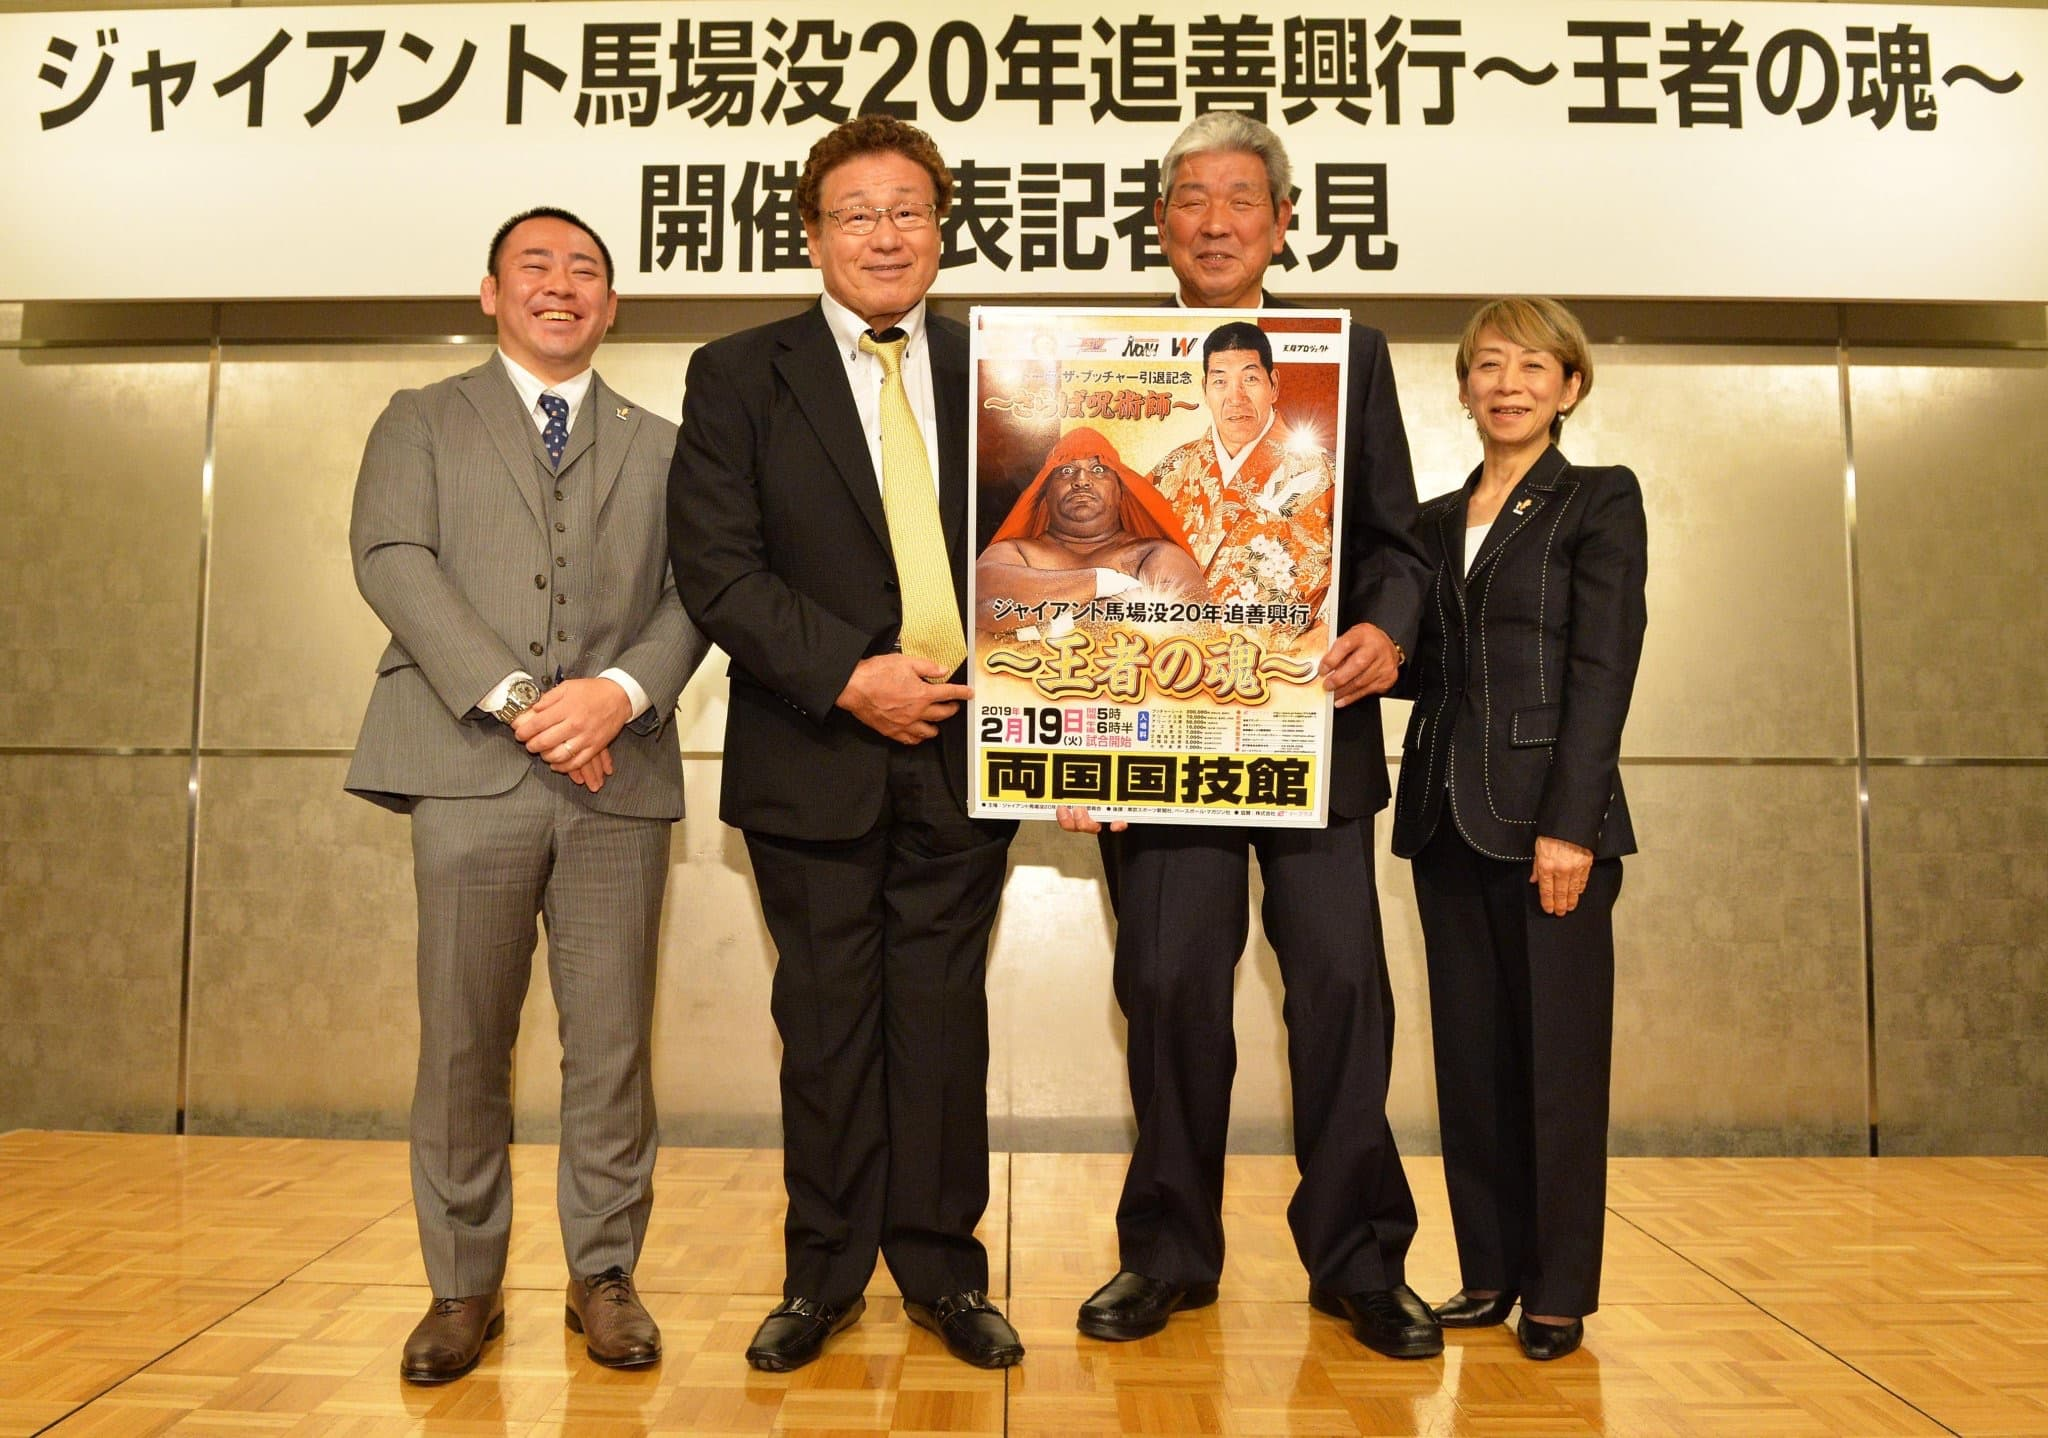 Pro-Wrestling All Star Battle: El deseo póstumo de Motoko Baba 11